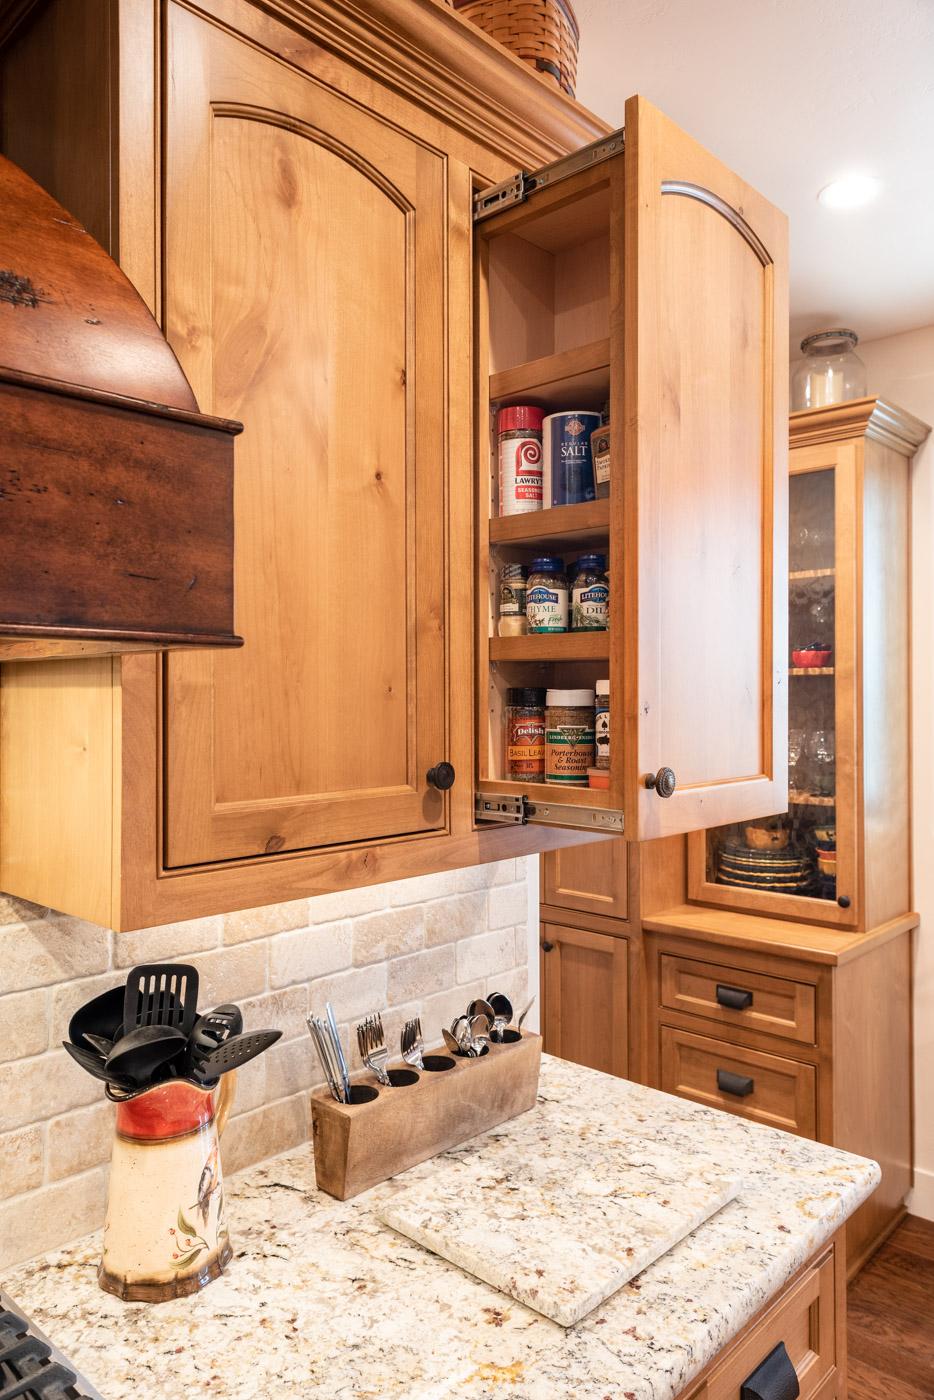 Tuscan Artisan custom stained Alder wood kitchen cabinet spice storage